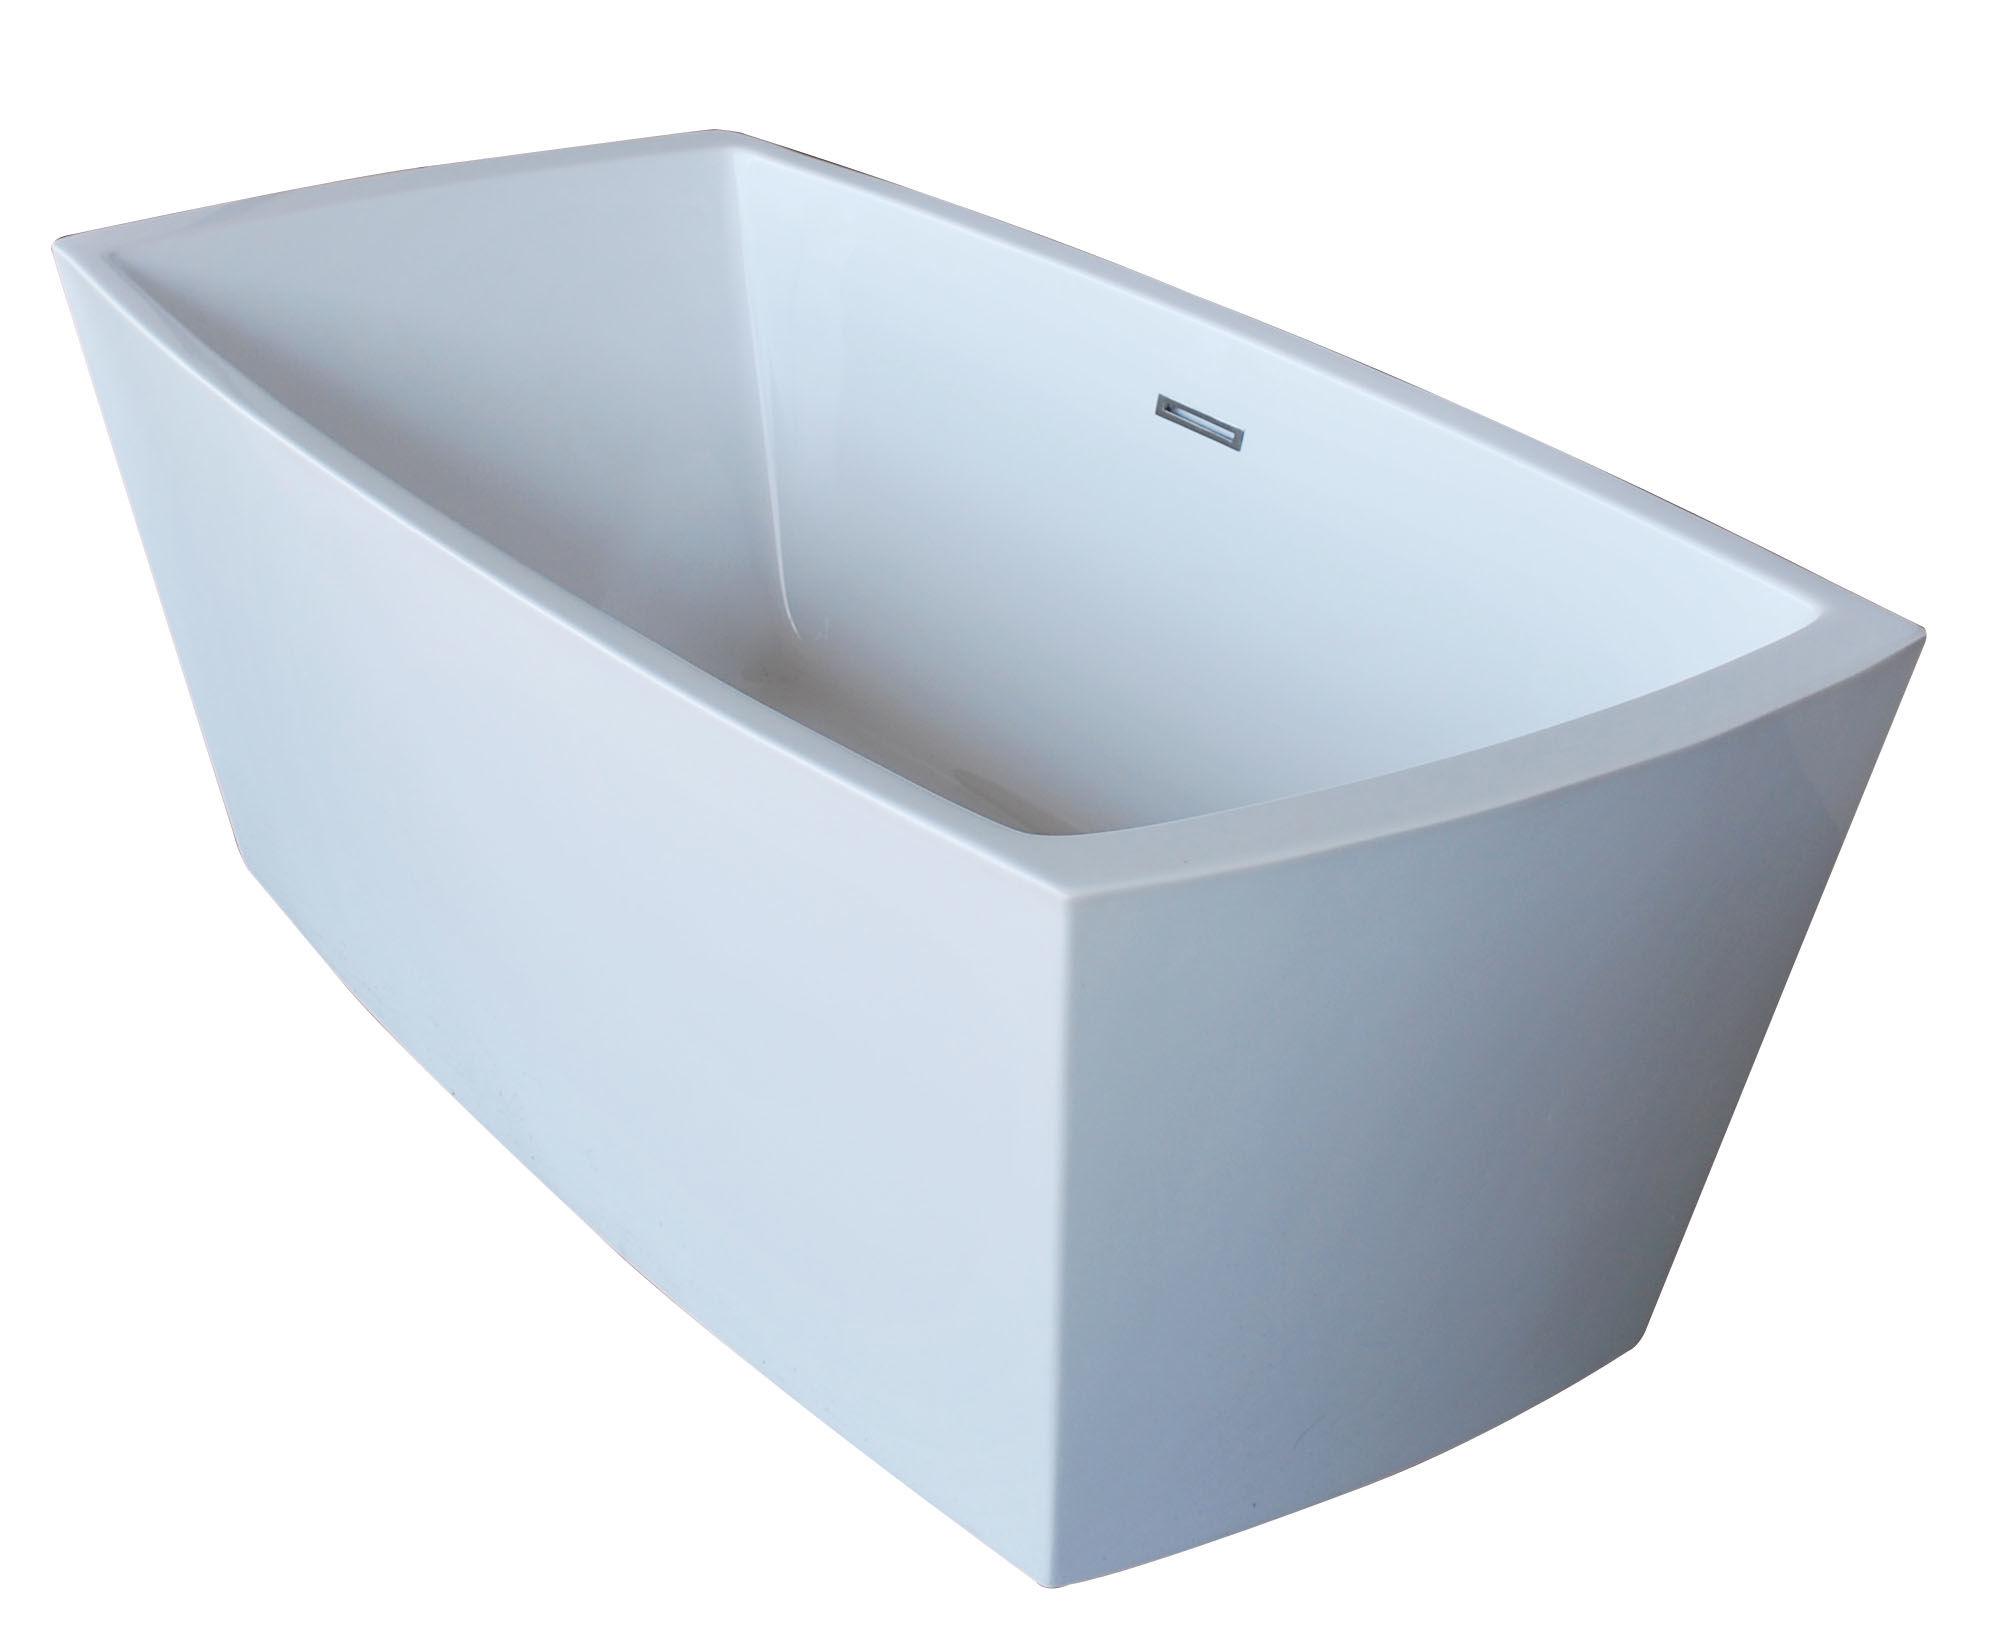 Avano AV6731ATSXCWXX White Freestanding Bathtubs 67\